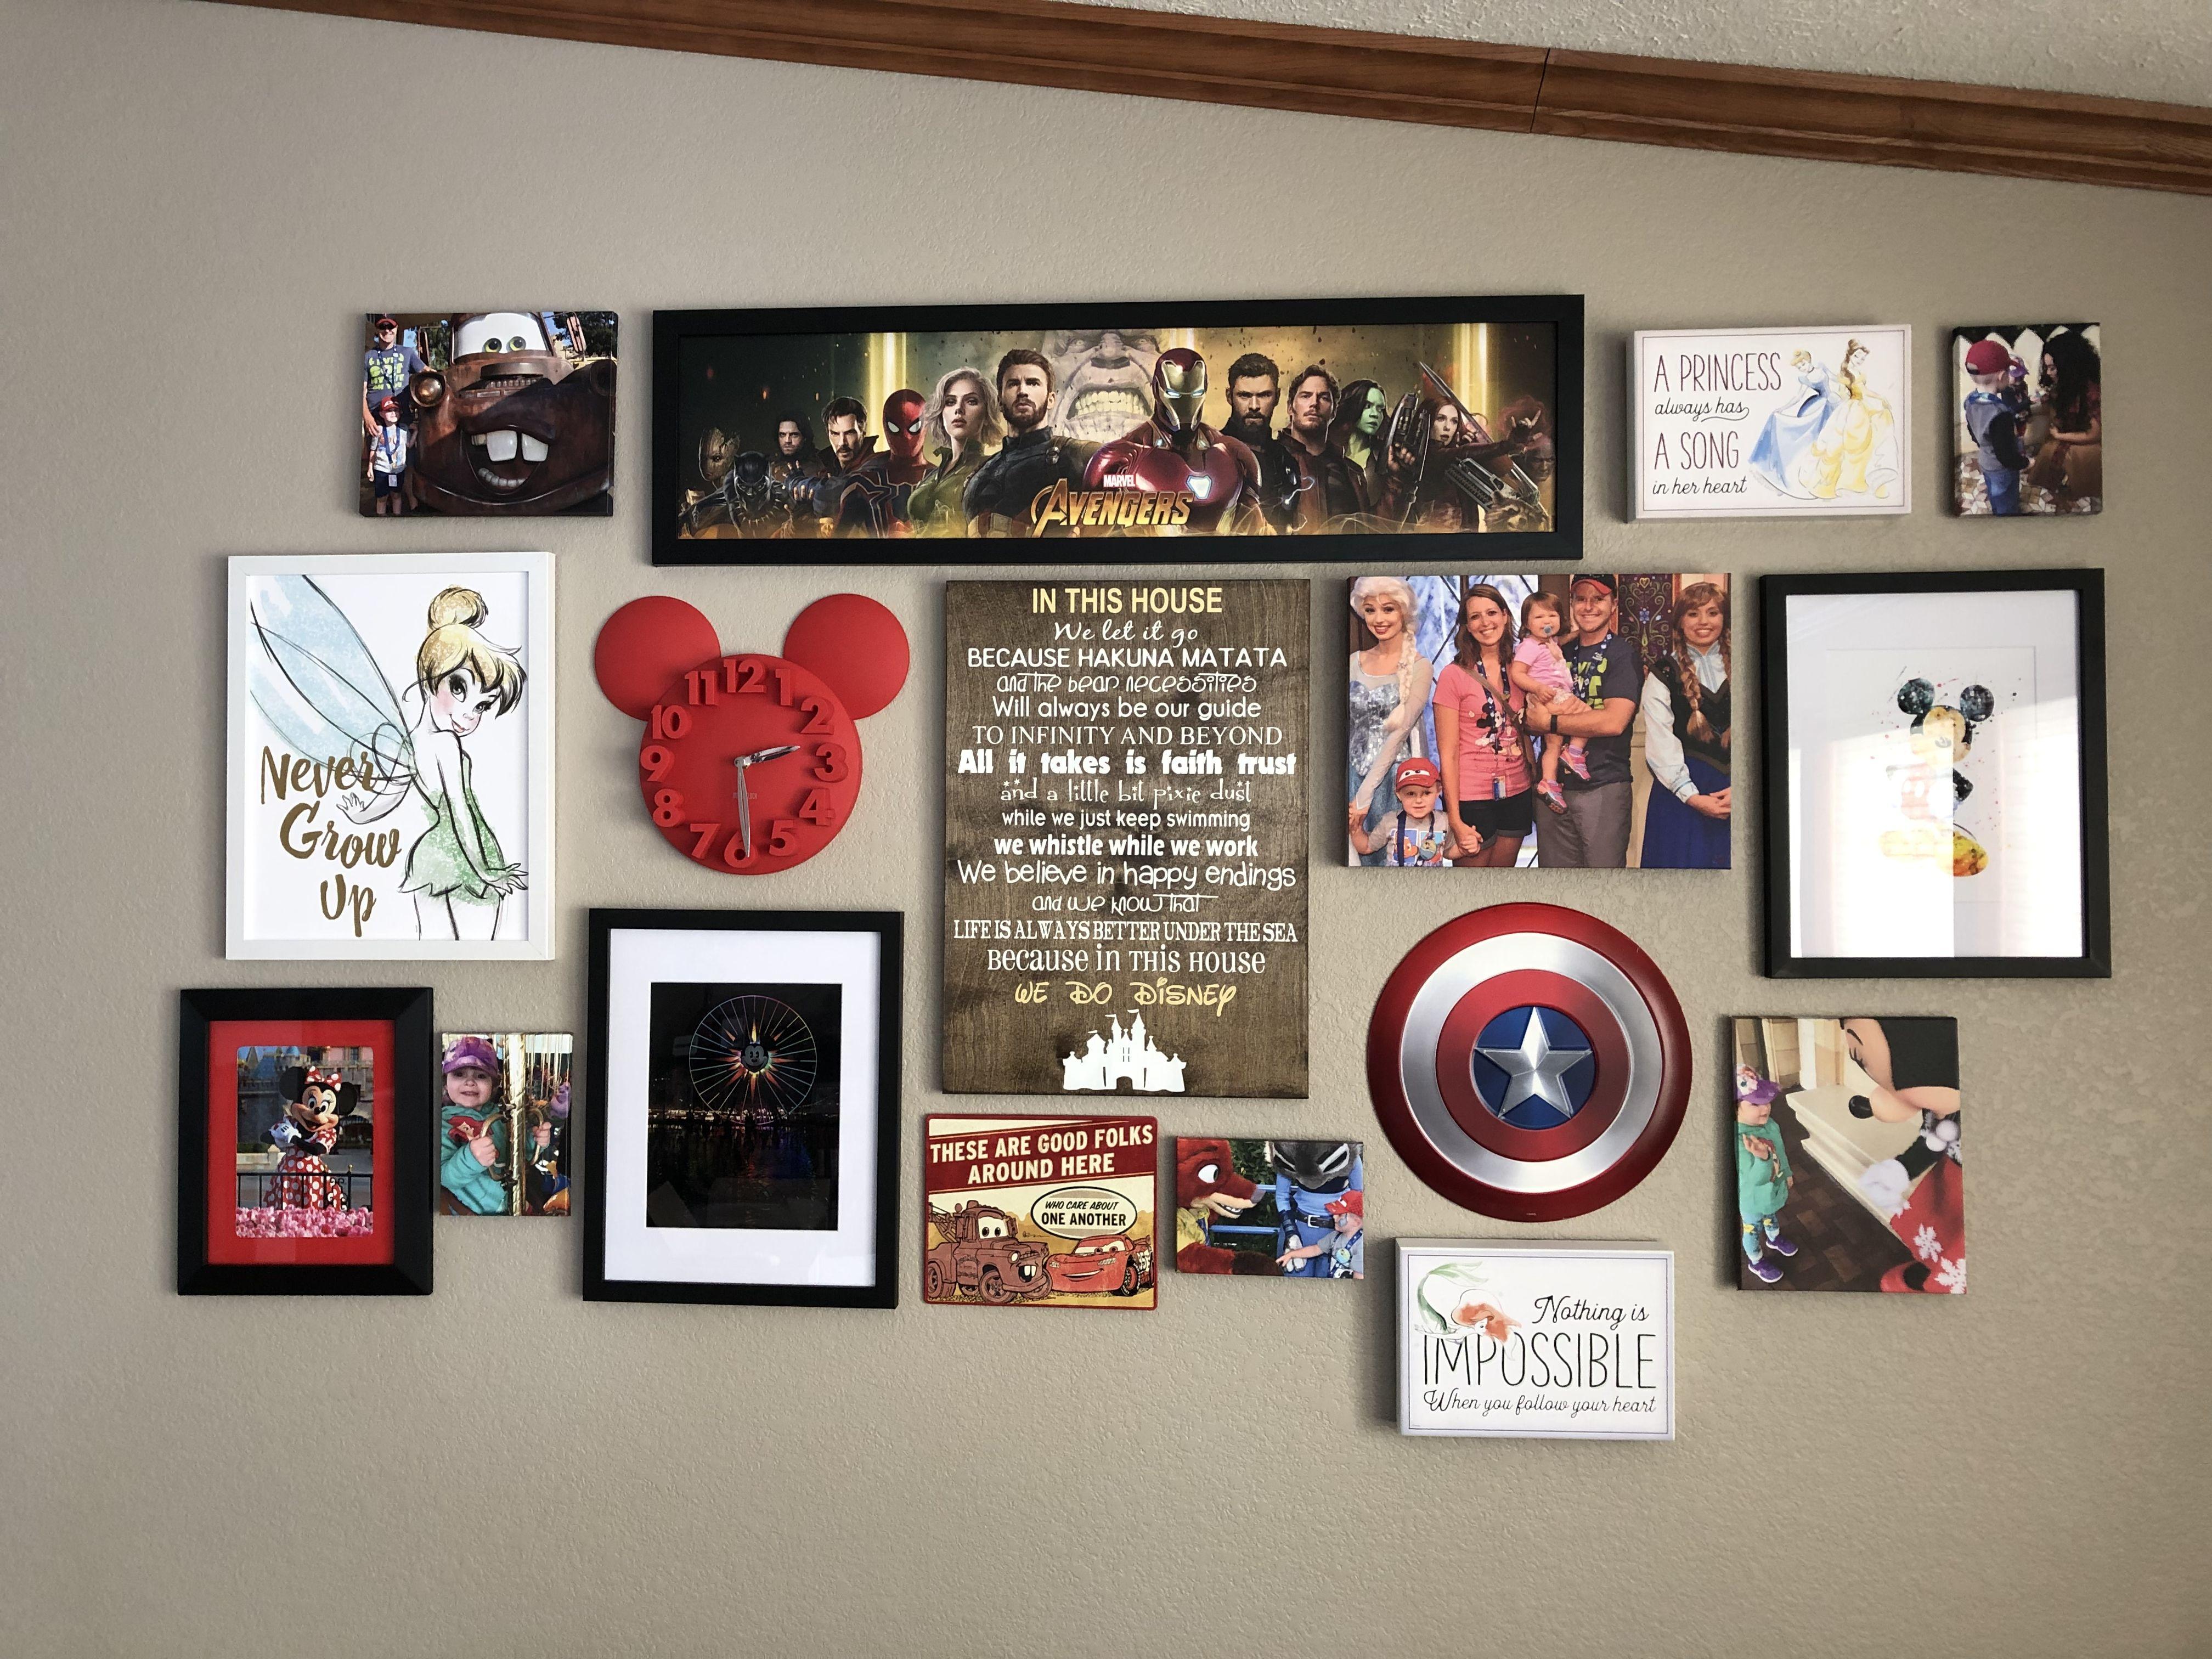 Disney Wall Collage Disney Wall Decor Disney Room Decor Disney Decor